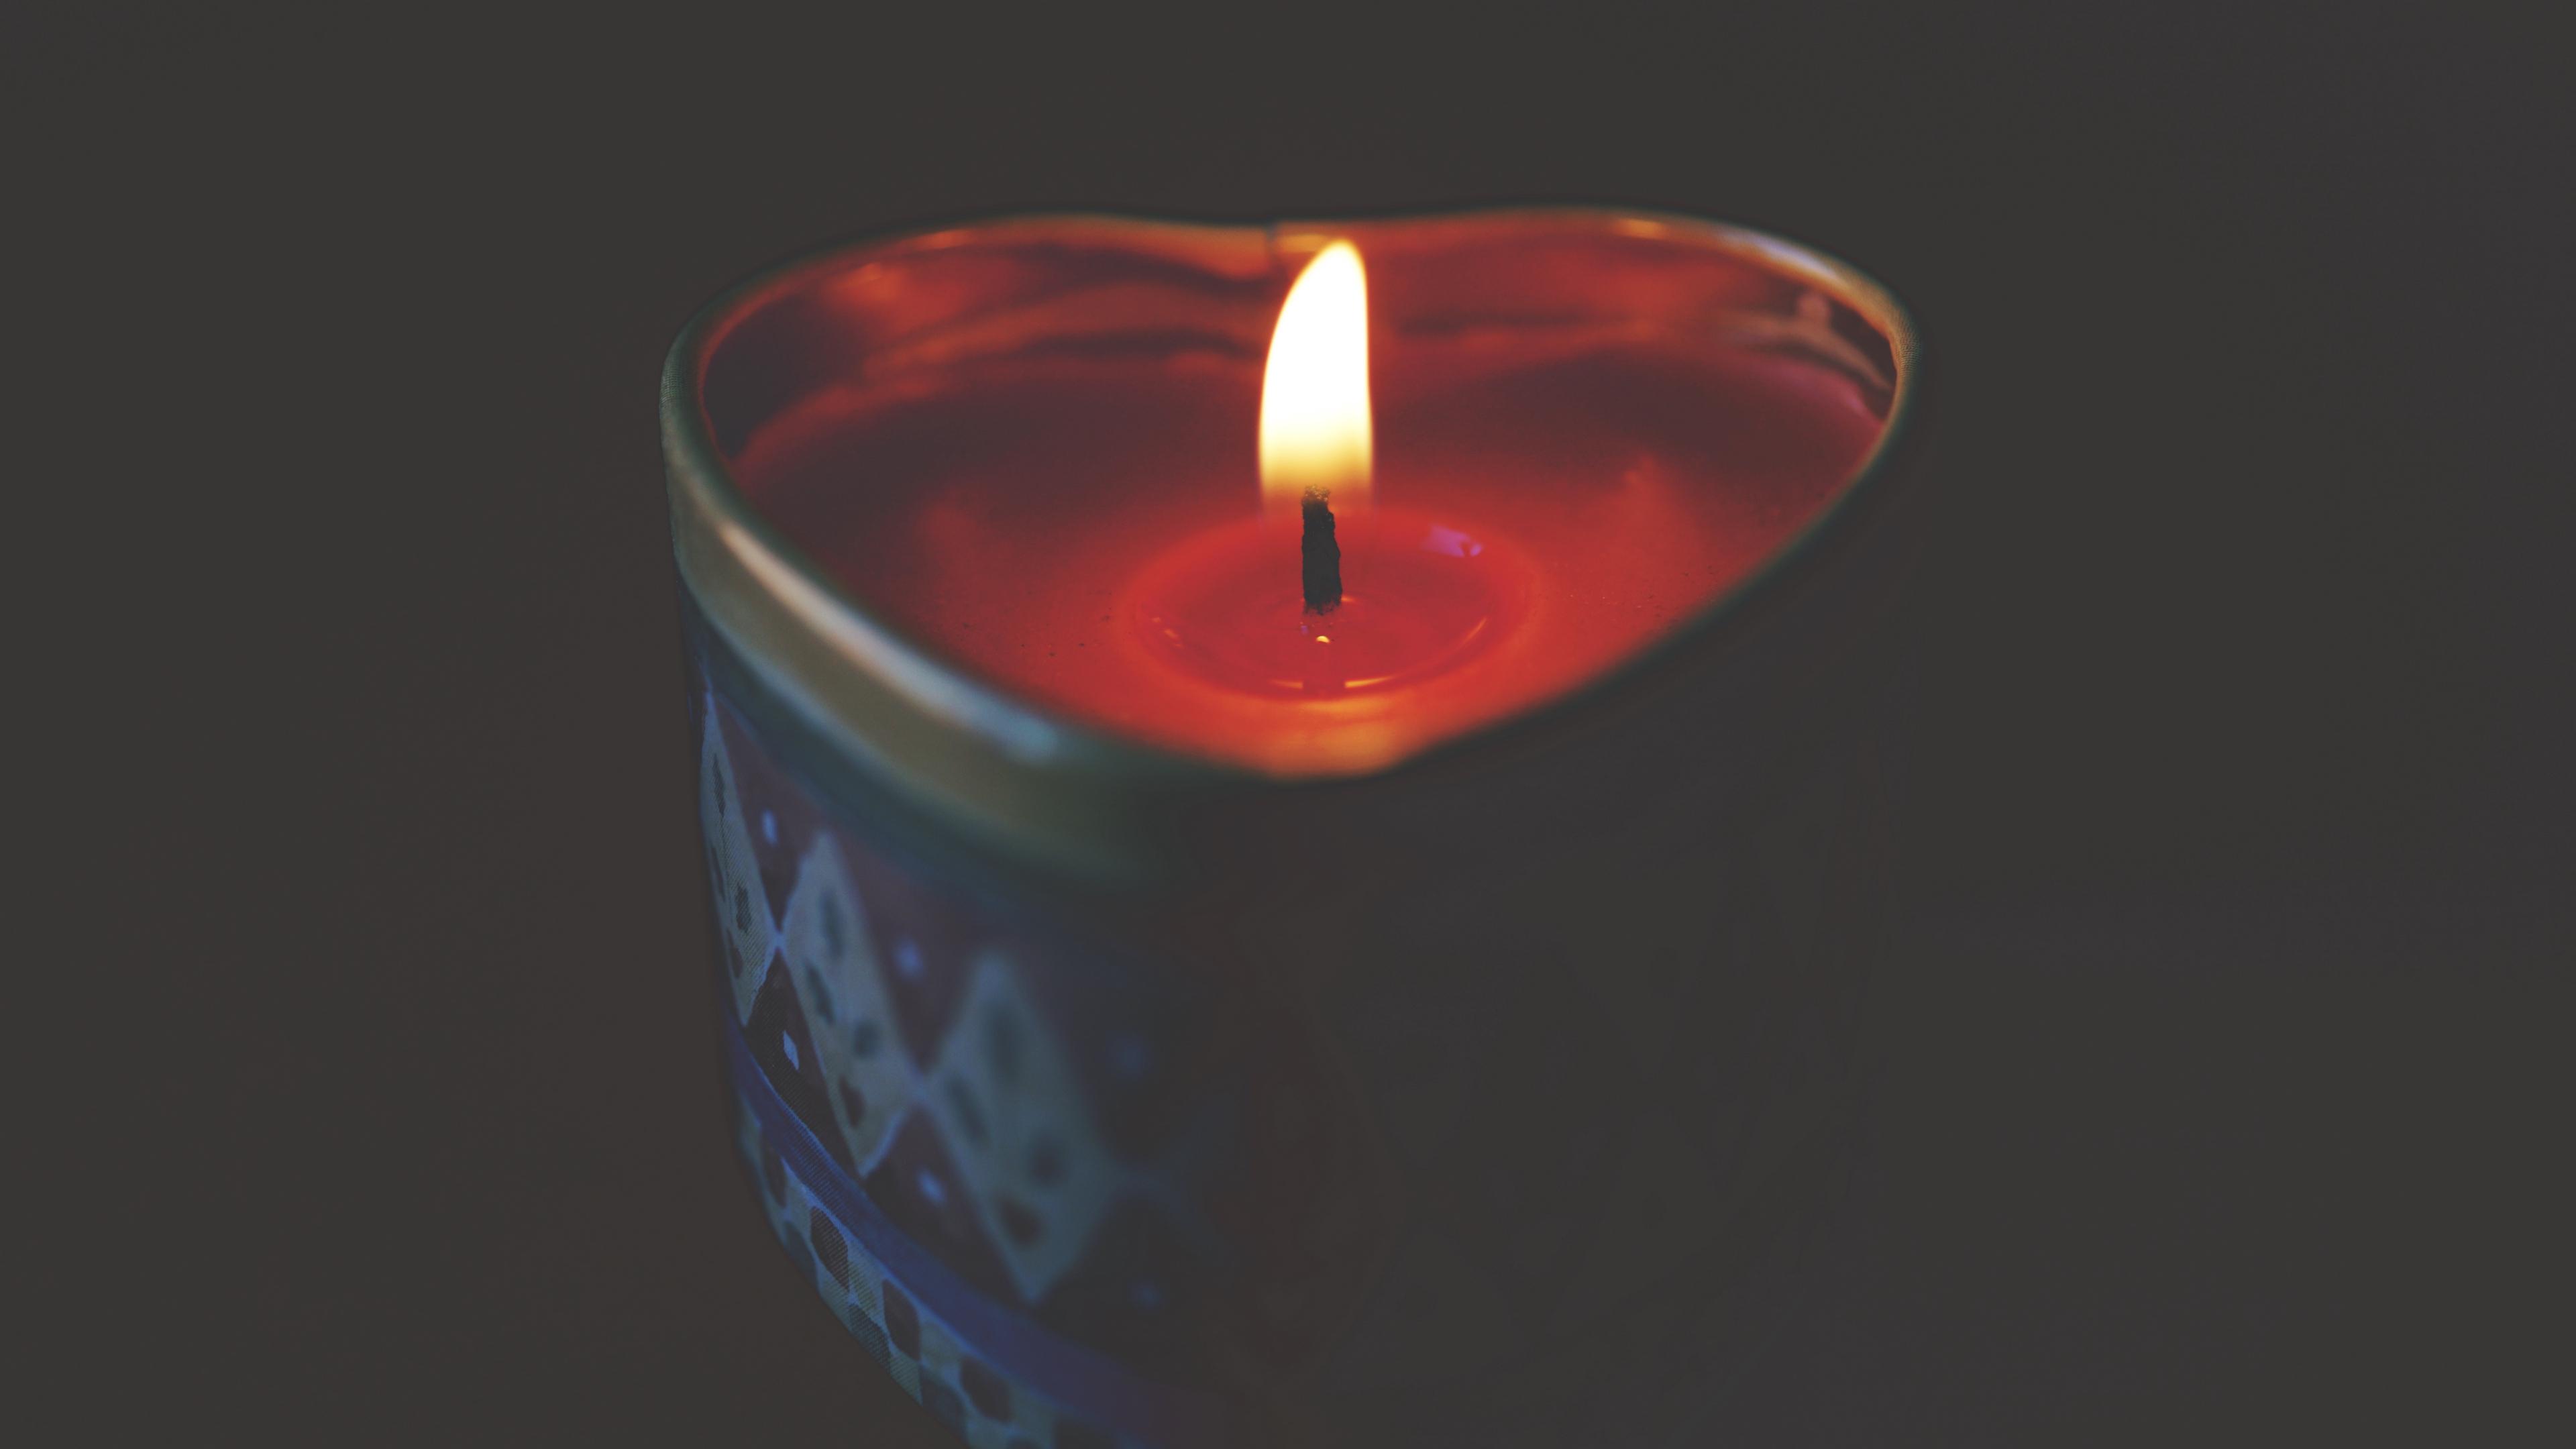 candle wax heart flame 4k 1540575338 - candle, wax, heart, flame 4k - wax, Heart, candle